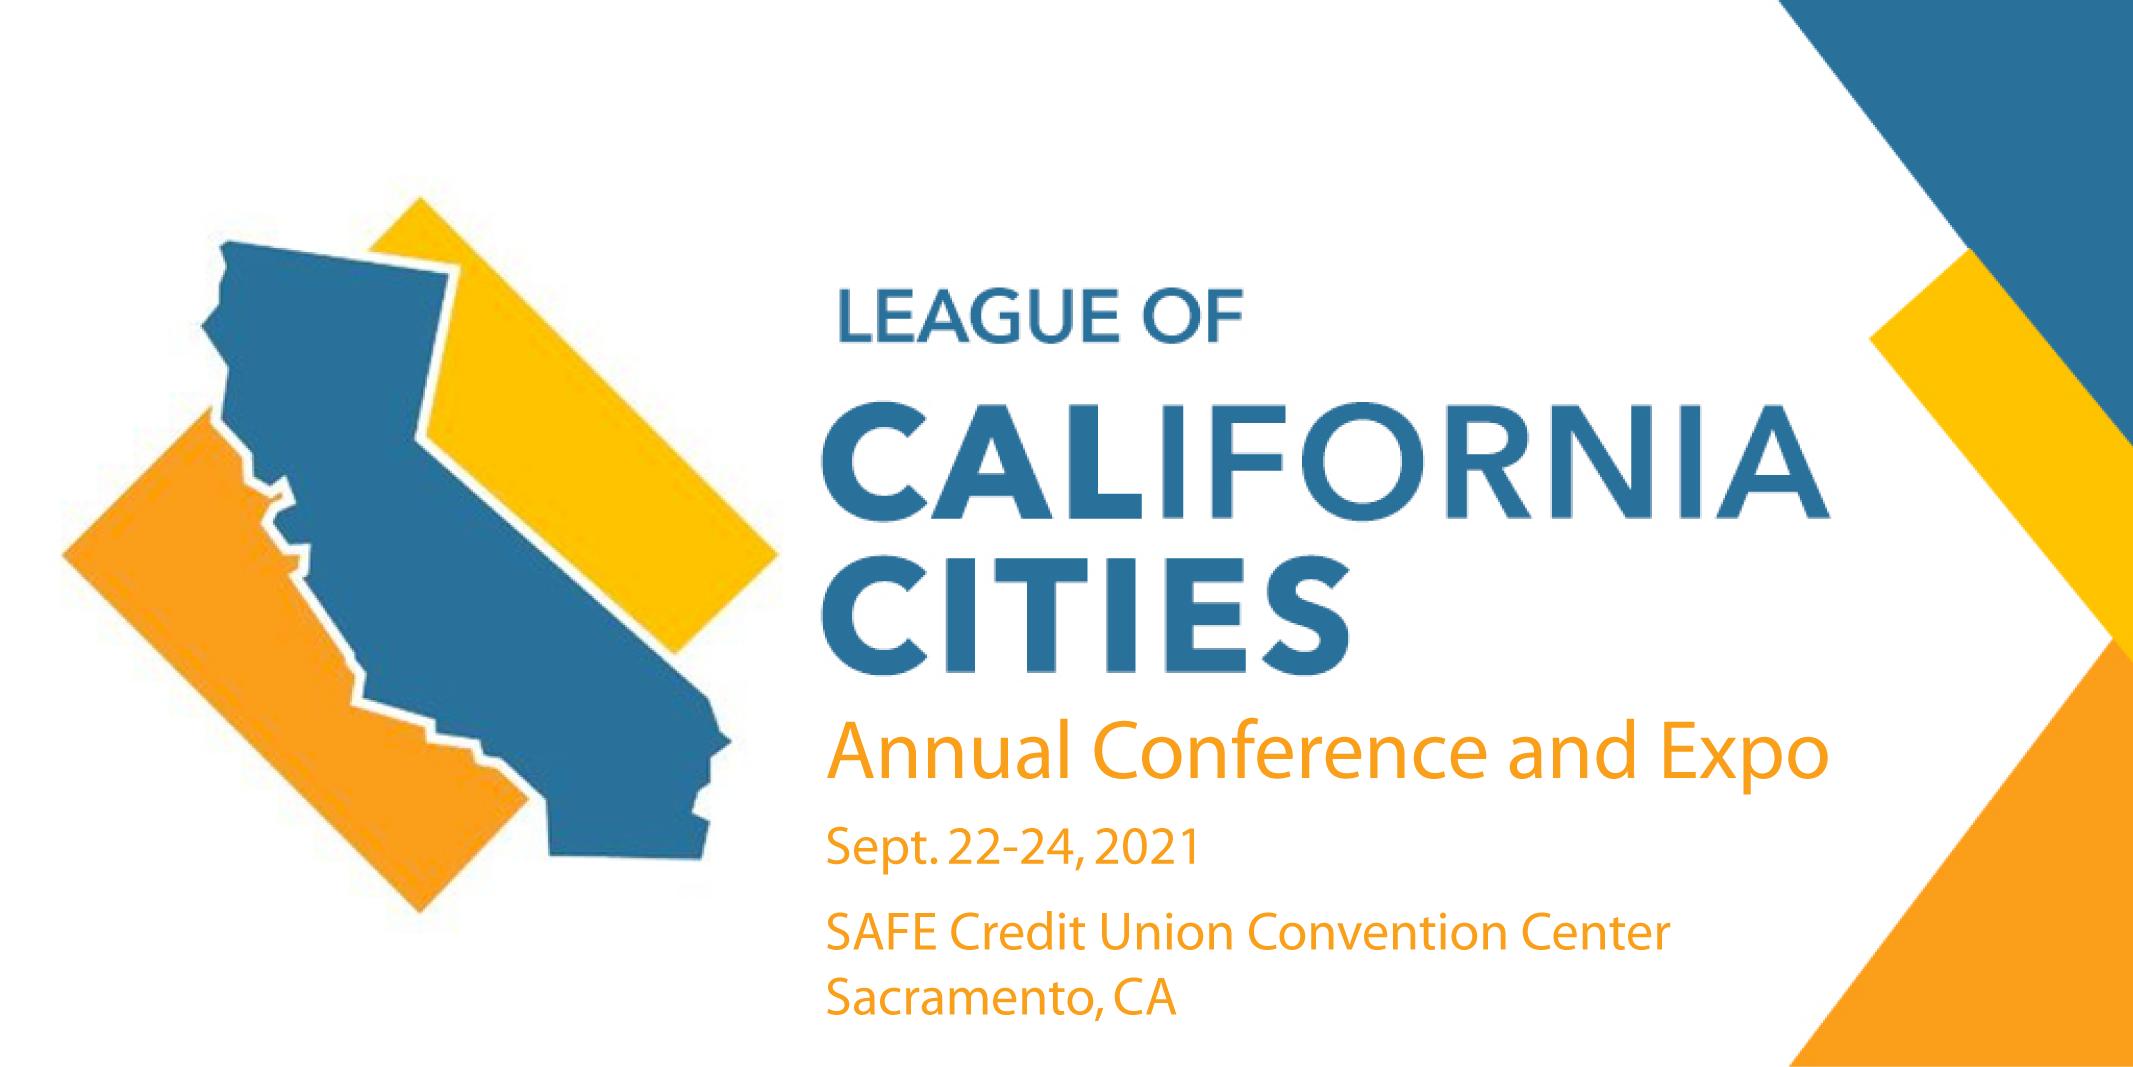 League of California Cities Conference and Expo   Sept. 22 – 24, 2021   Sacramento, CA